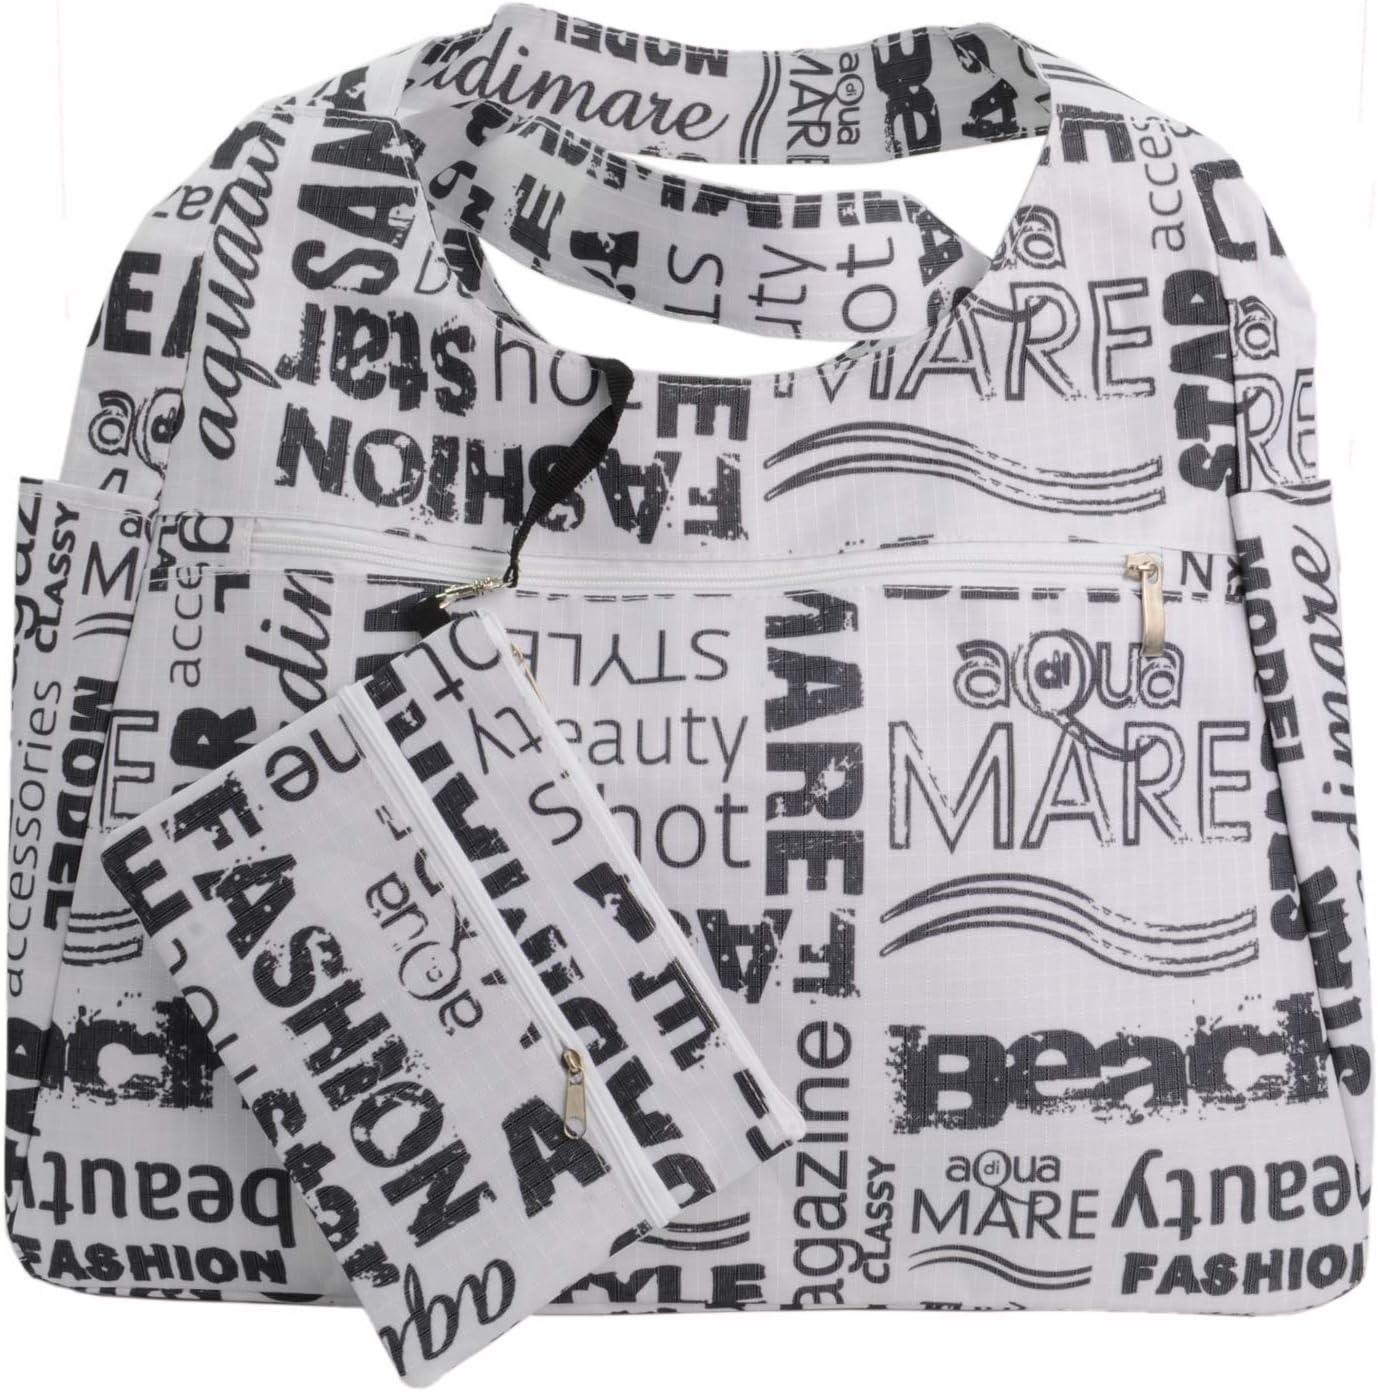 M No Gender Aqua Di Mare Round Beach Bag Printed White